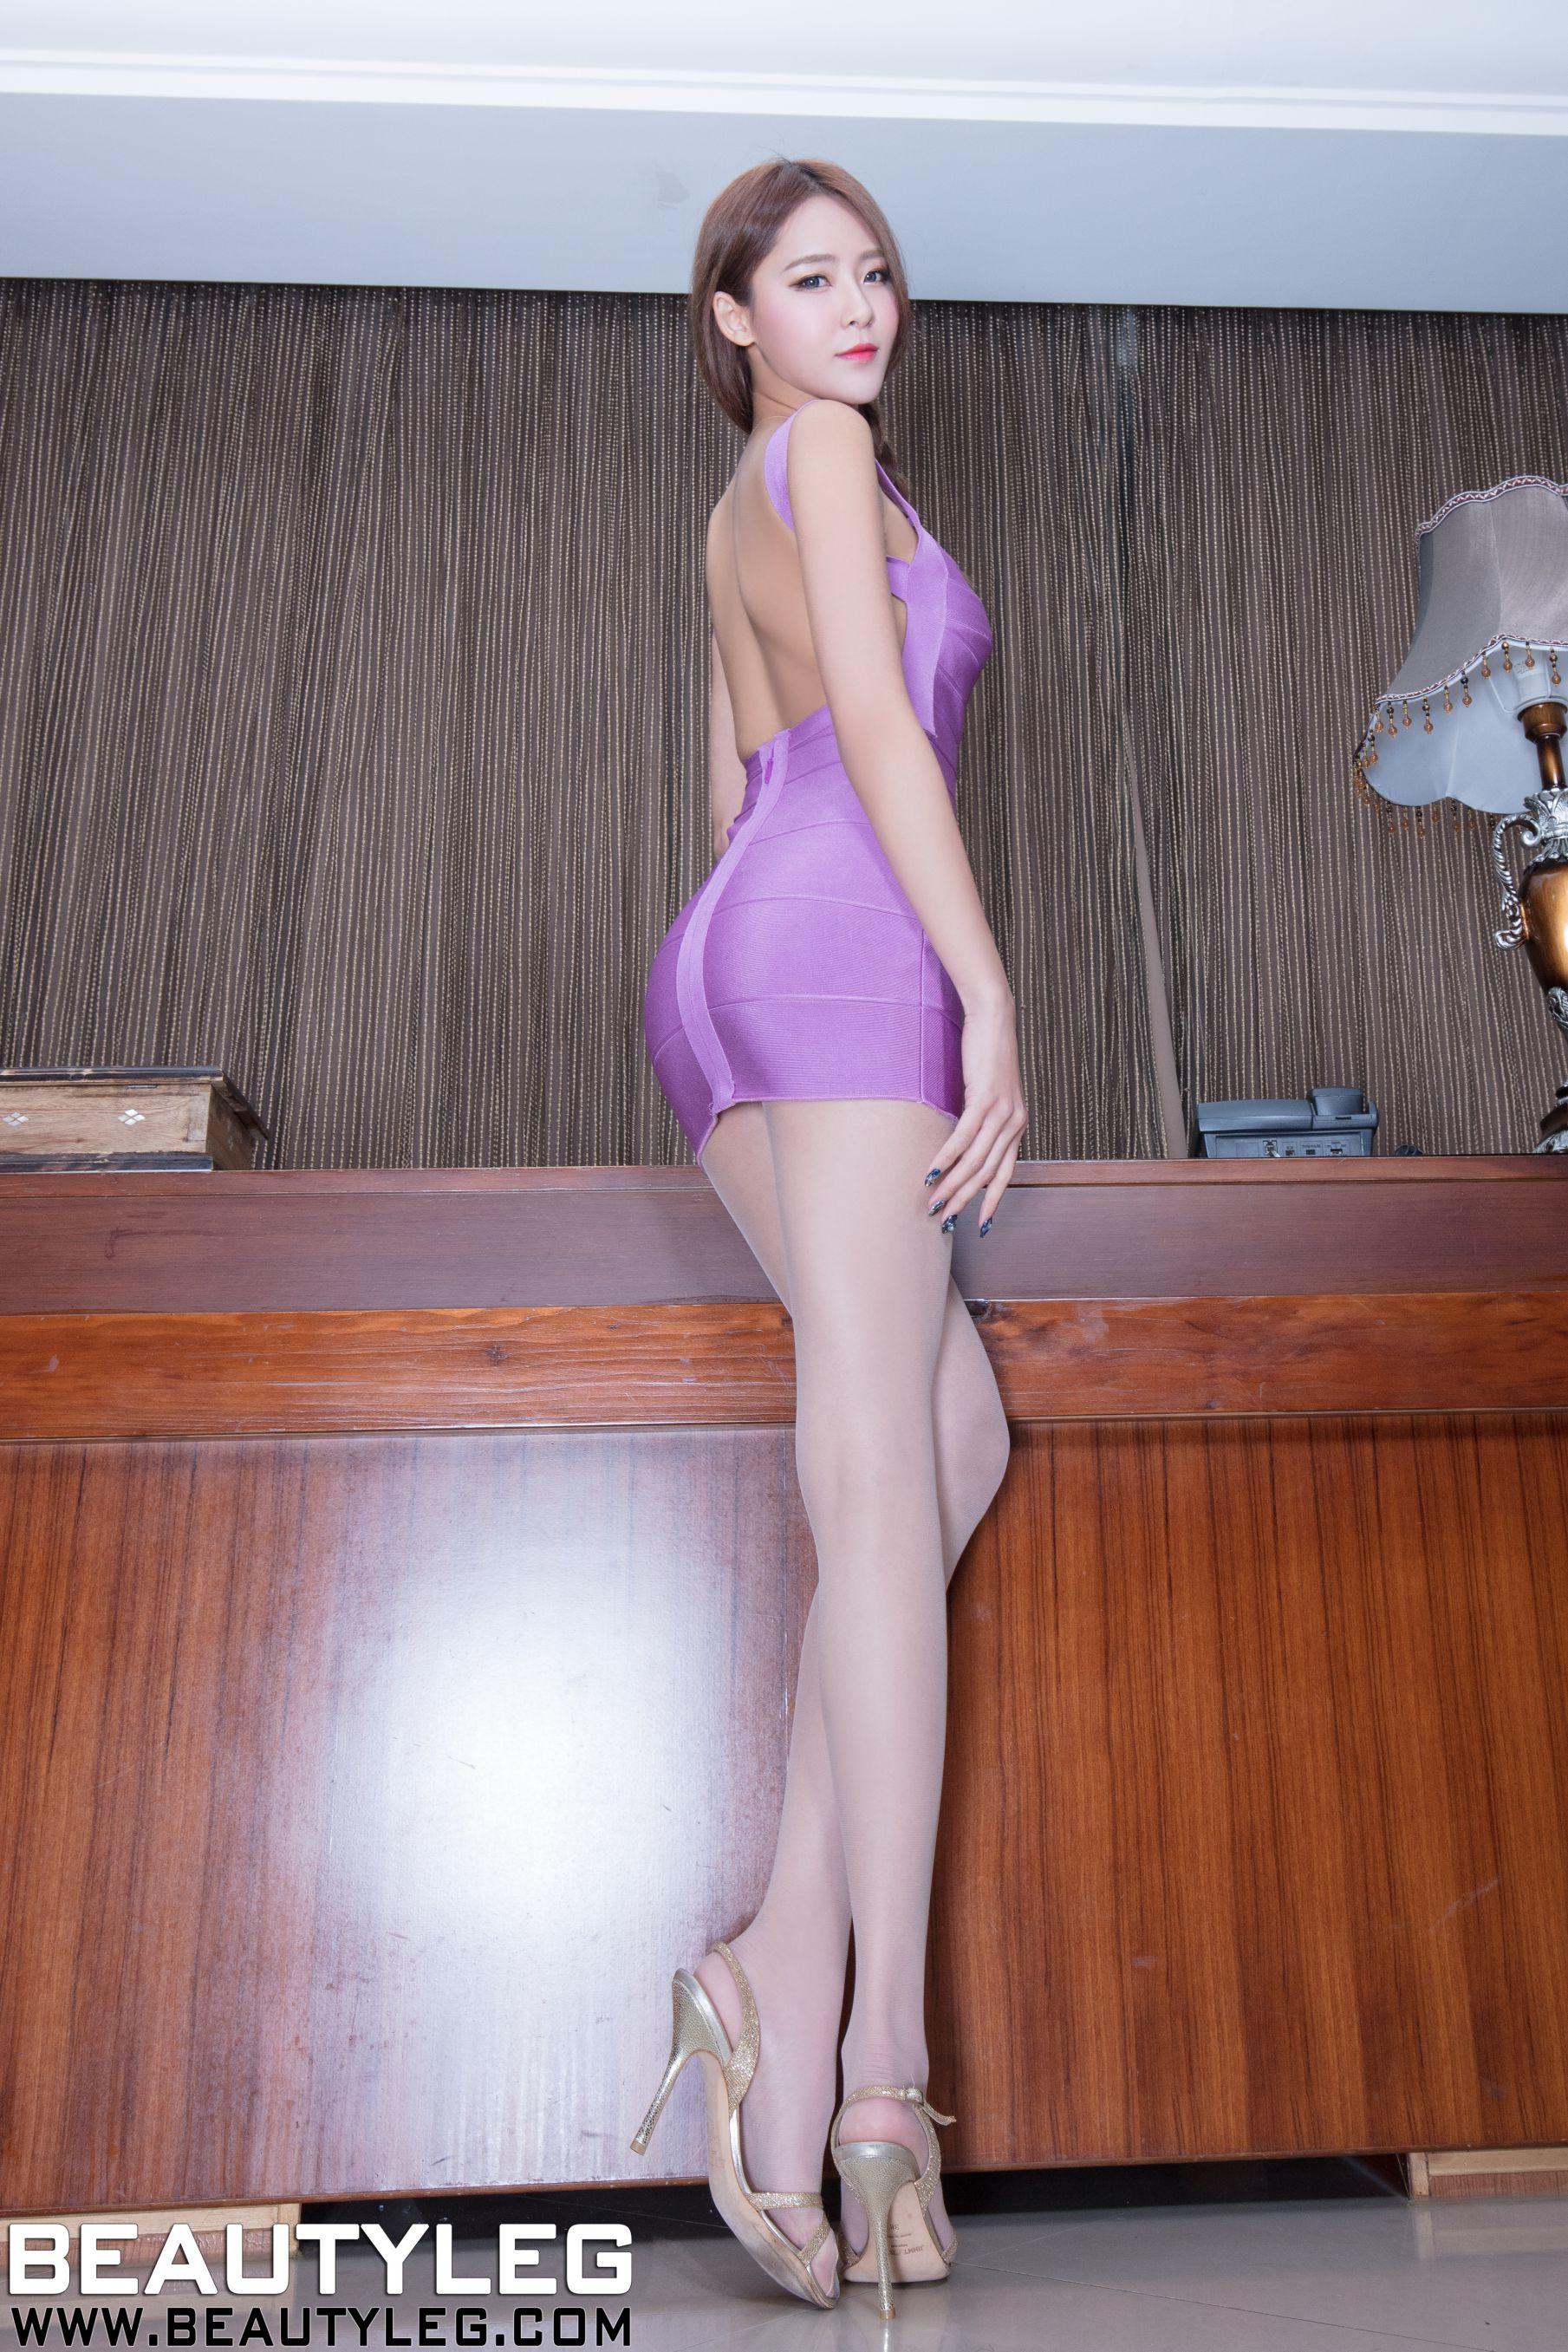 VOL.702 [Beautyleg]美腿包臀裙美女:Winnie小雪(庄咏惠,庄温妮,腿模Winnie)高品质写真套图(46P)